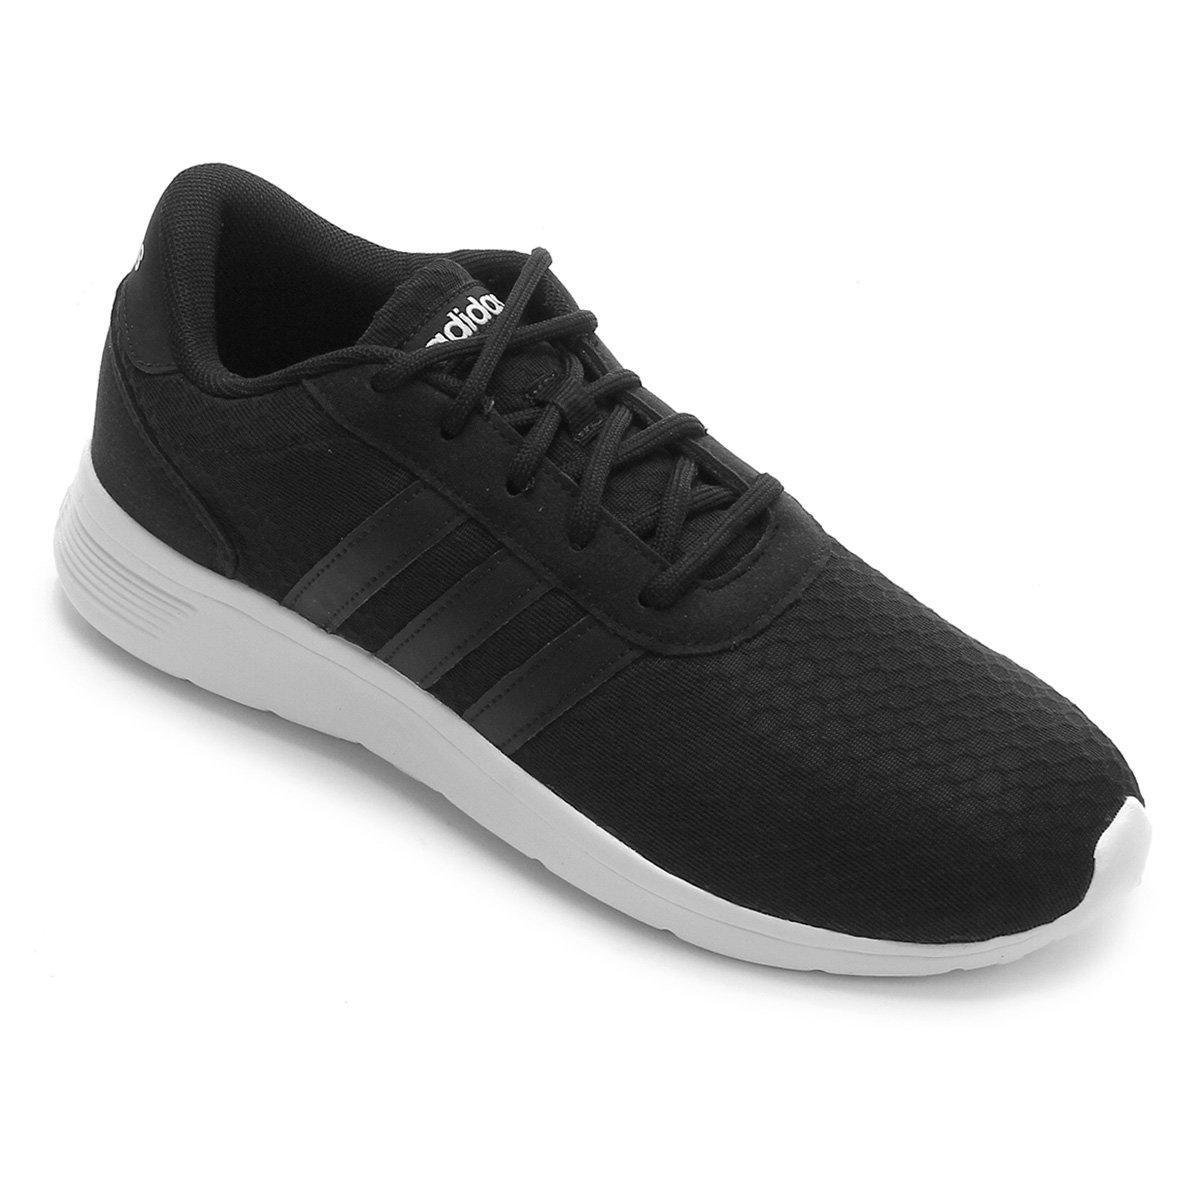 Tênis Adidas Lite Racer Masculino - Tam: 37